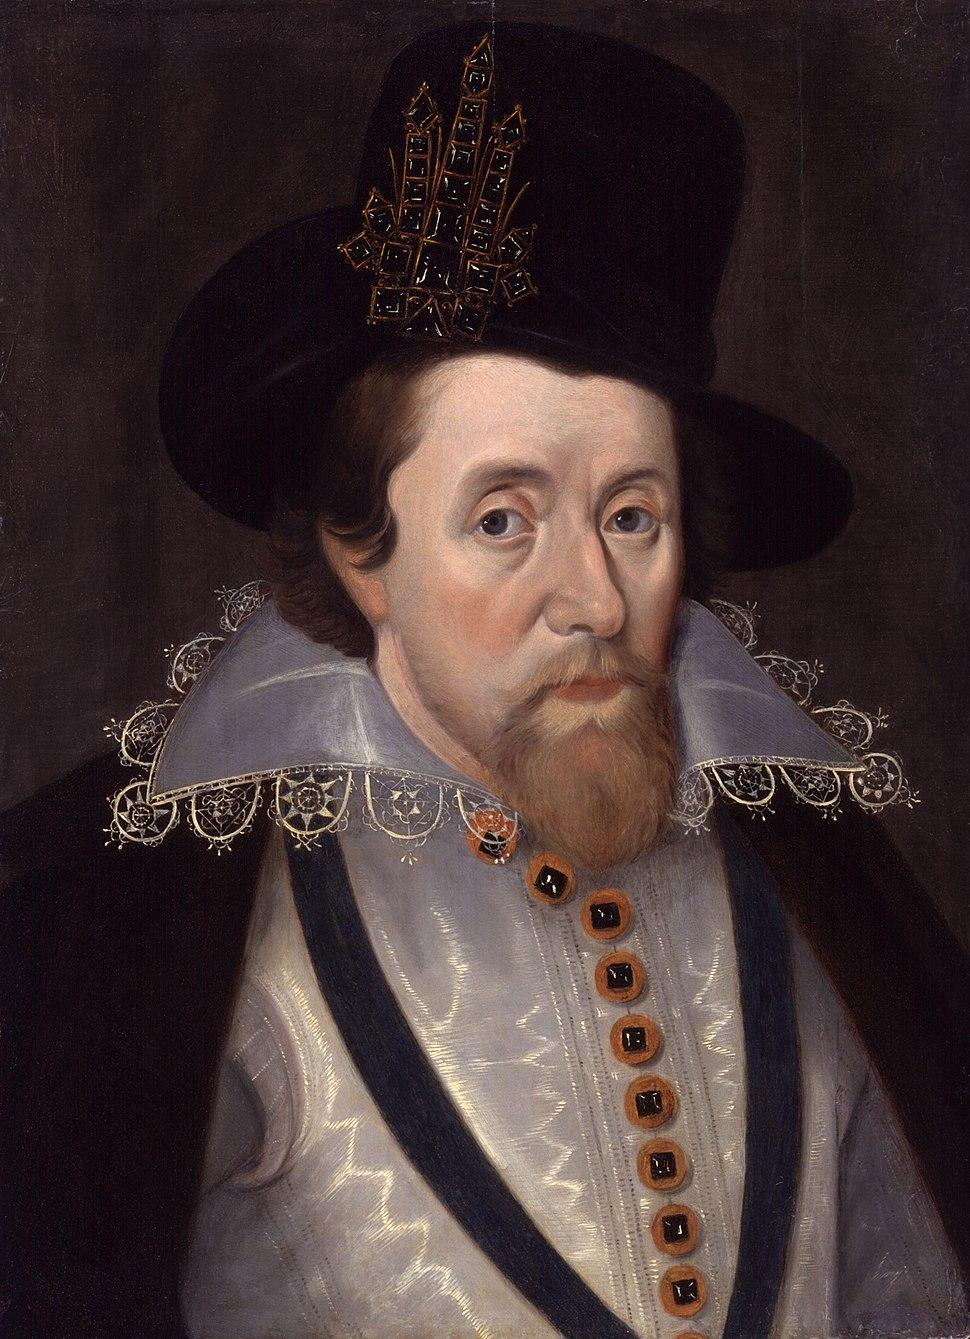 King James I of England and VI of Scotland by John De Critz the Elder